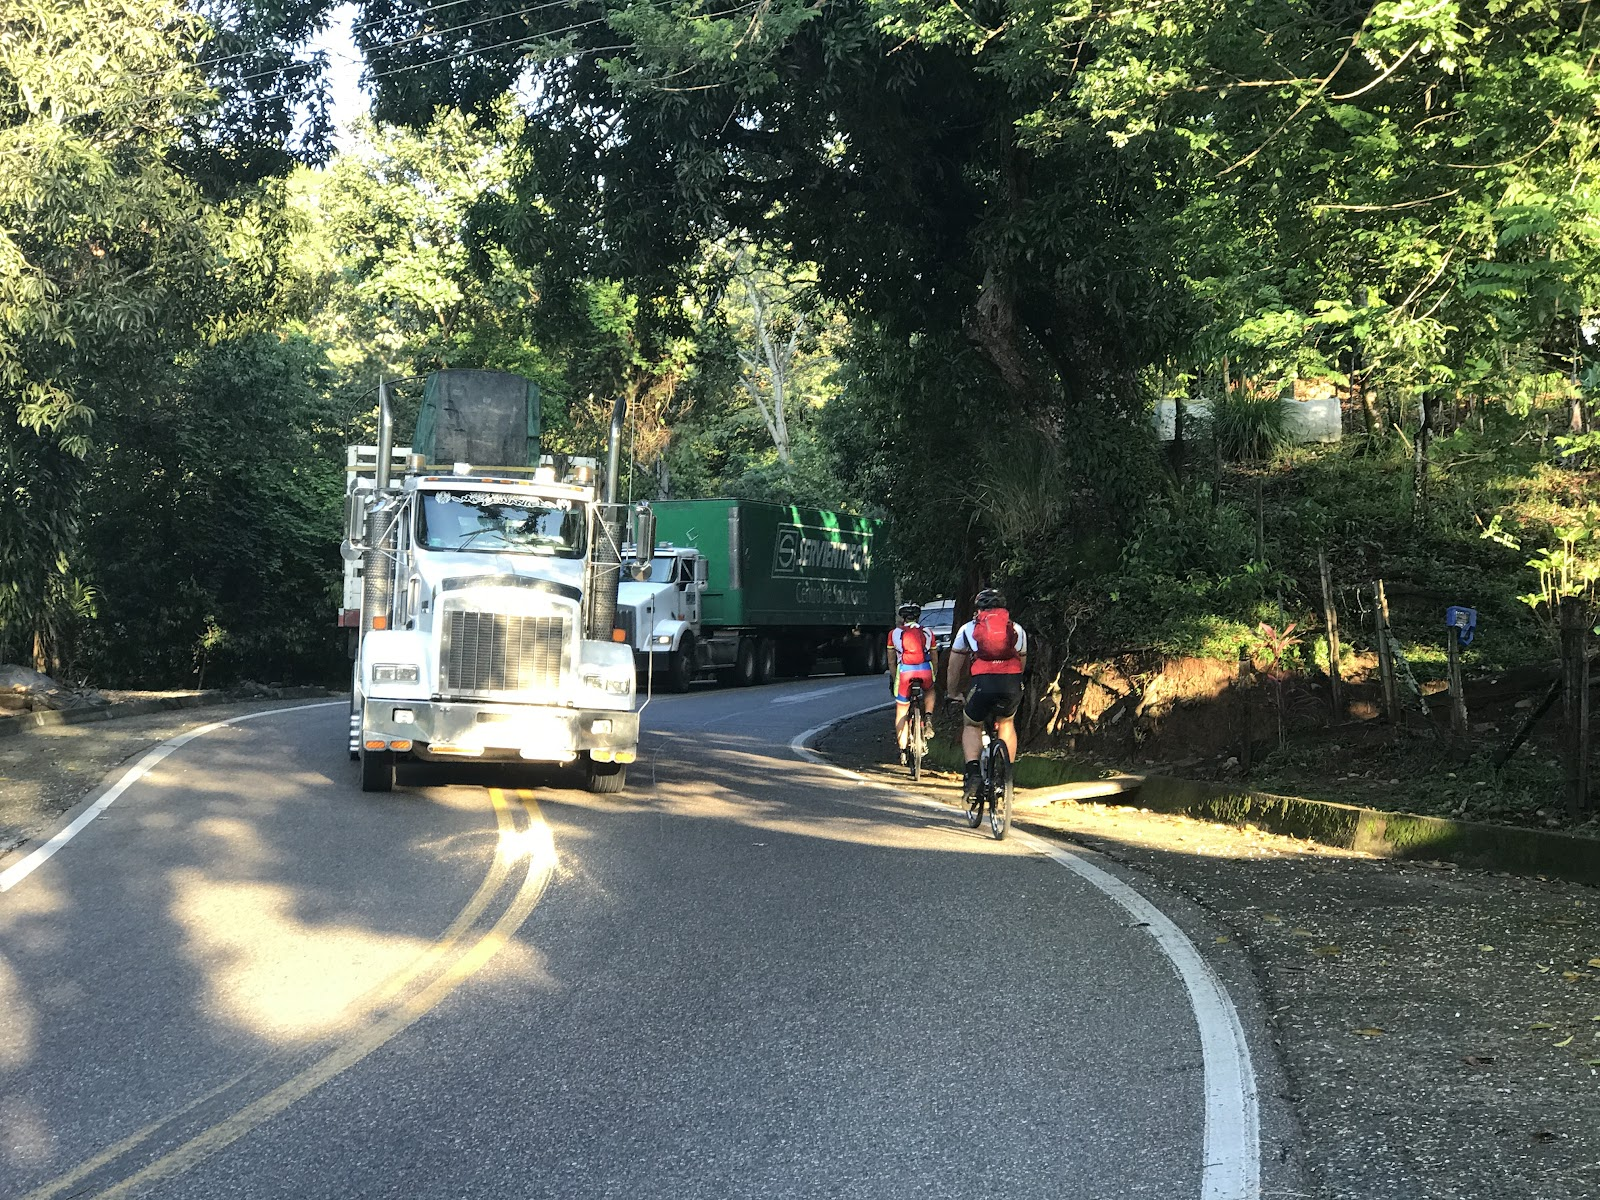 Climbing Alto de Letras by bike - roadway and big trucks.